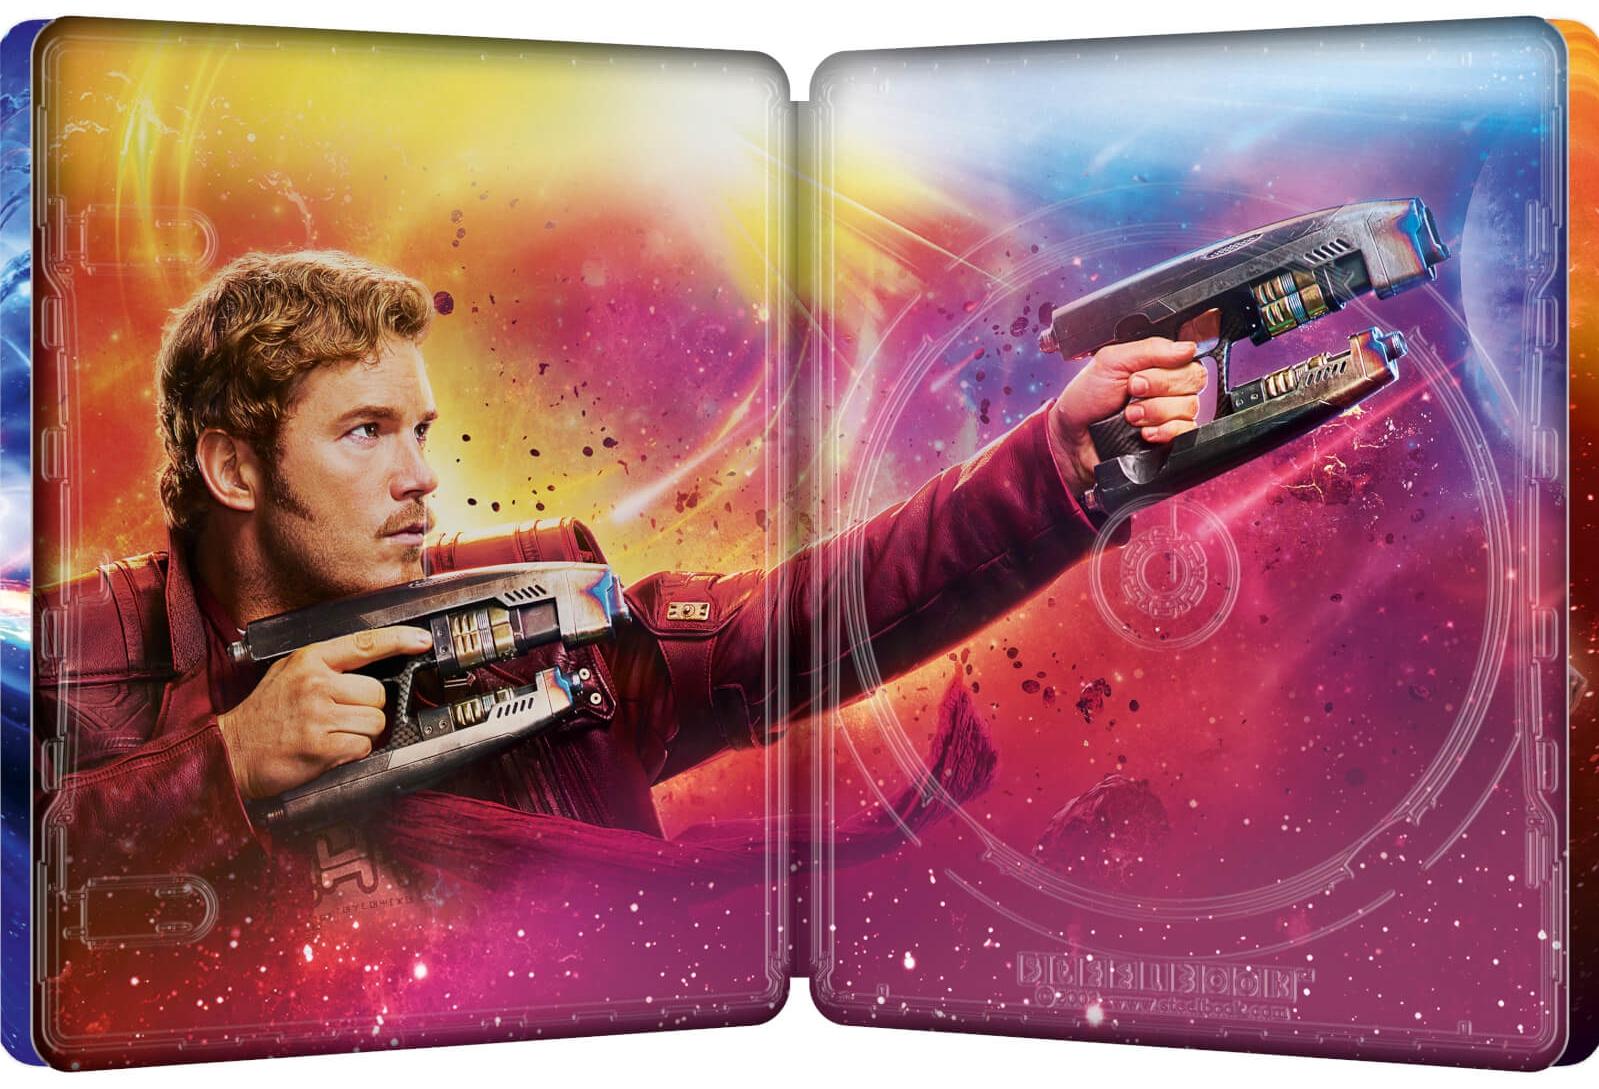 Guardians of the Galaxy Vol. 2 SteelBook inside